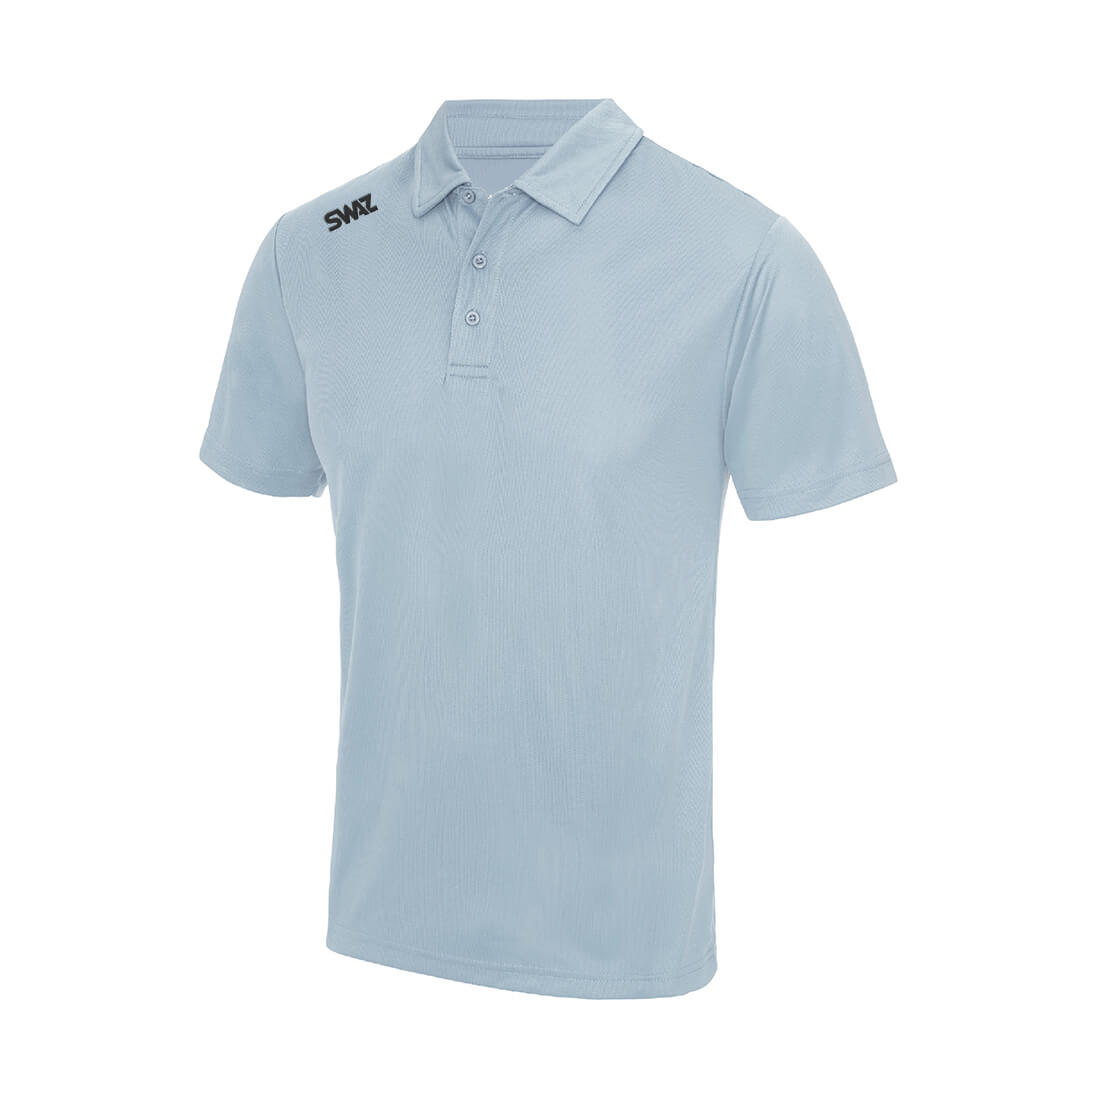 League Youth Football Polo Shirt   Football Training Kit and Teamwear – SWAZ